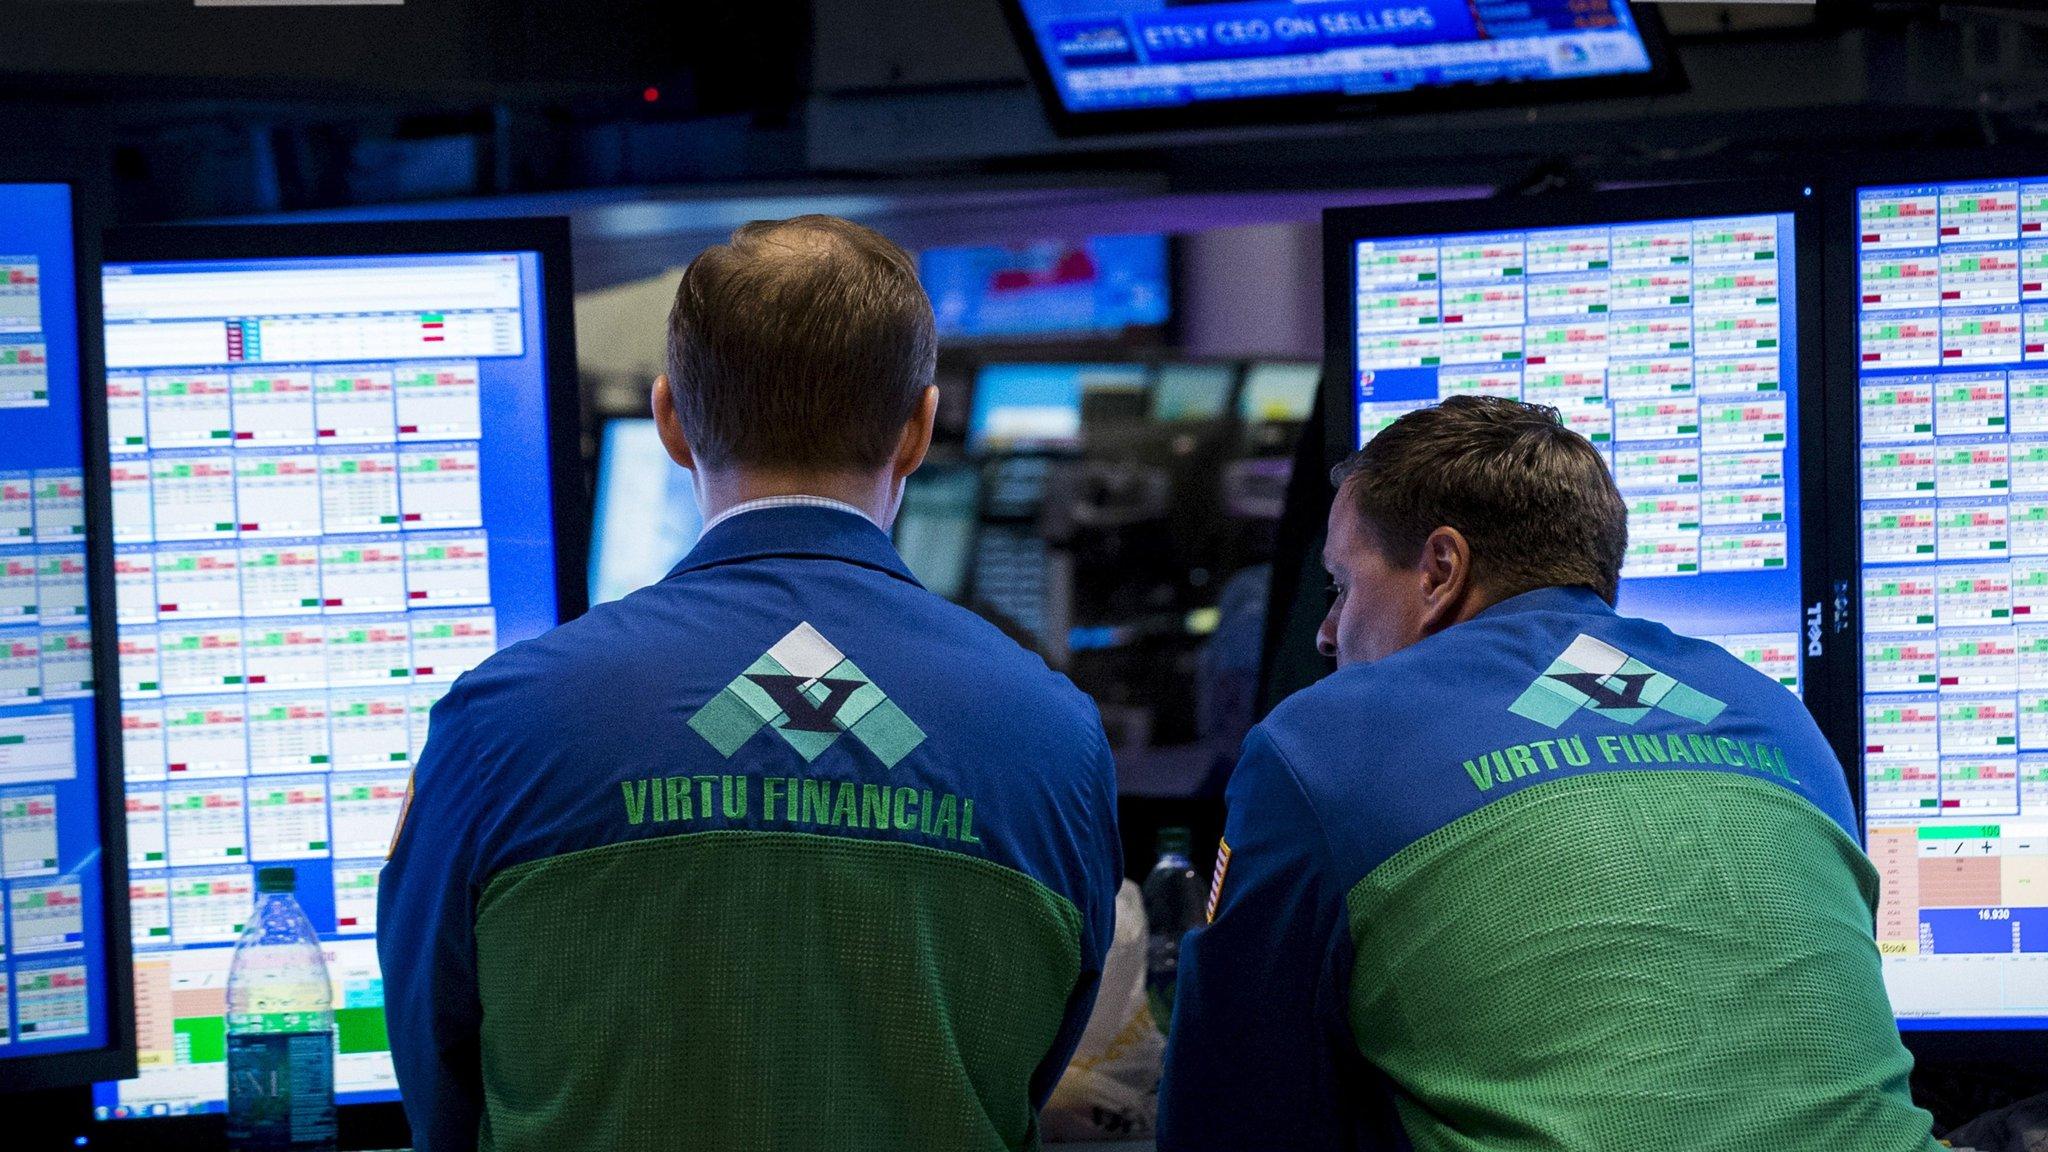 Virtu and Citadel Securities go head to head in HFT